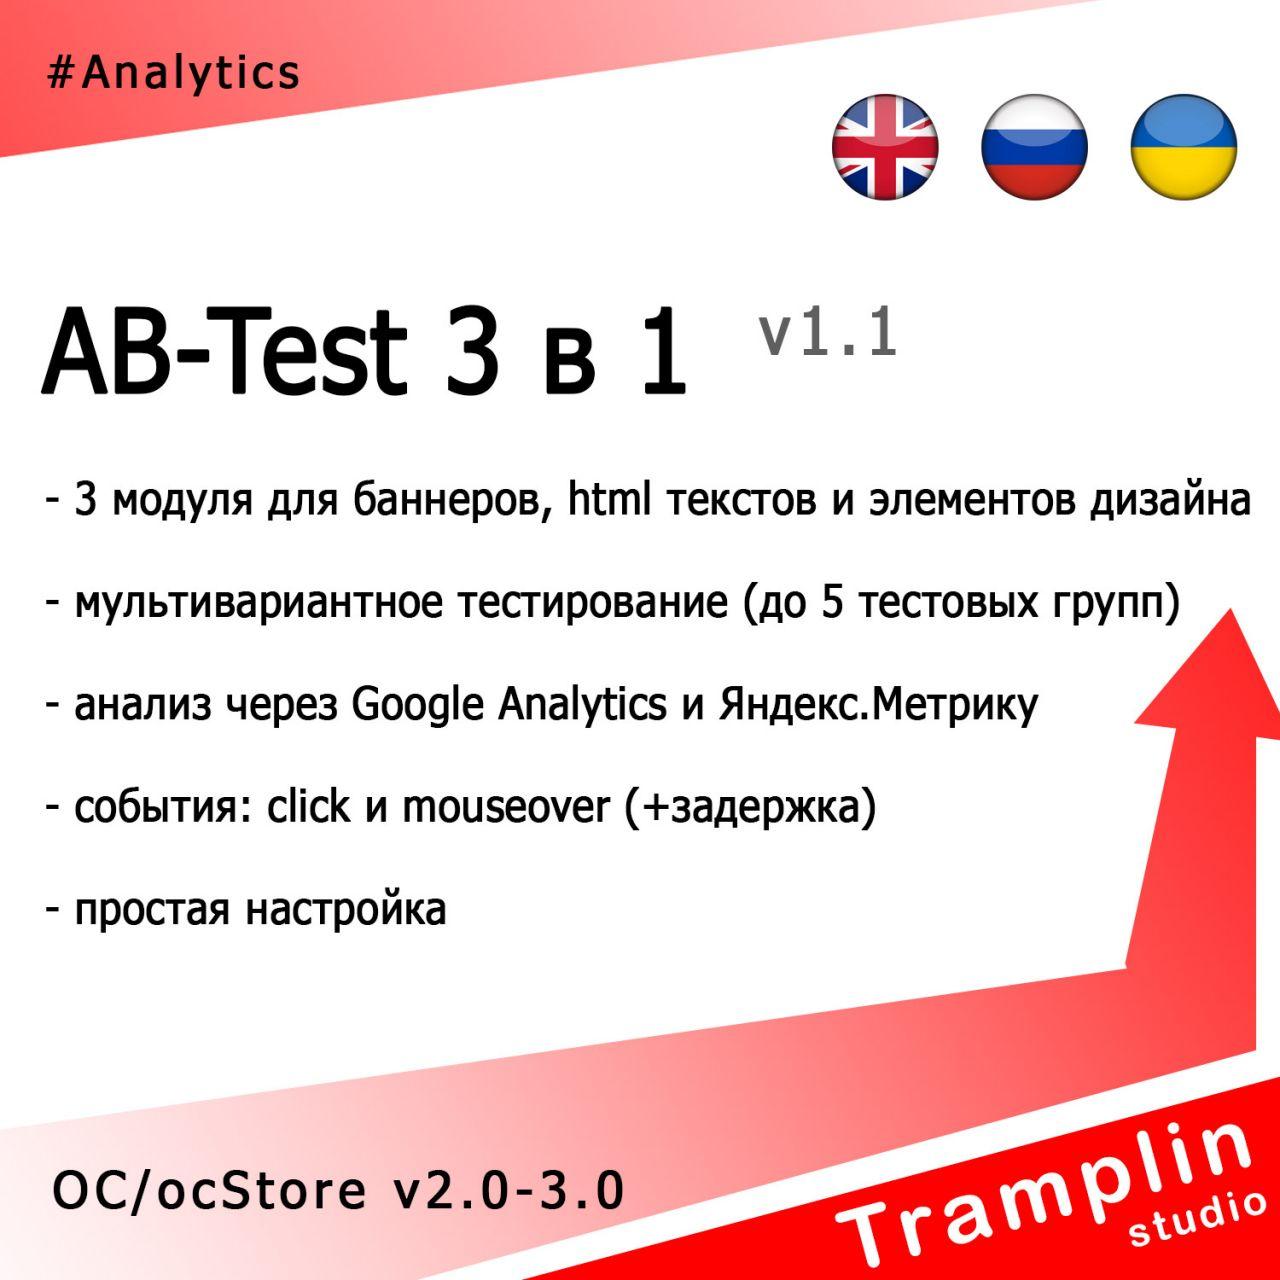 TS AB-Test 3 в 1 из категории Прочие для CMS OpenCart (ОпенКарт)